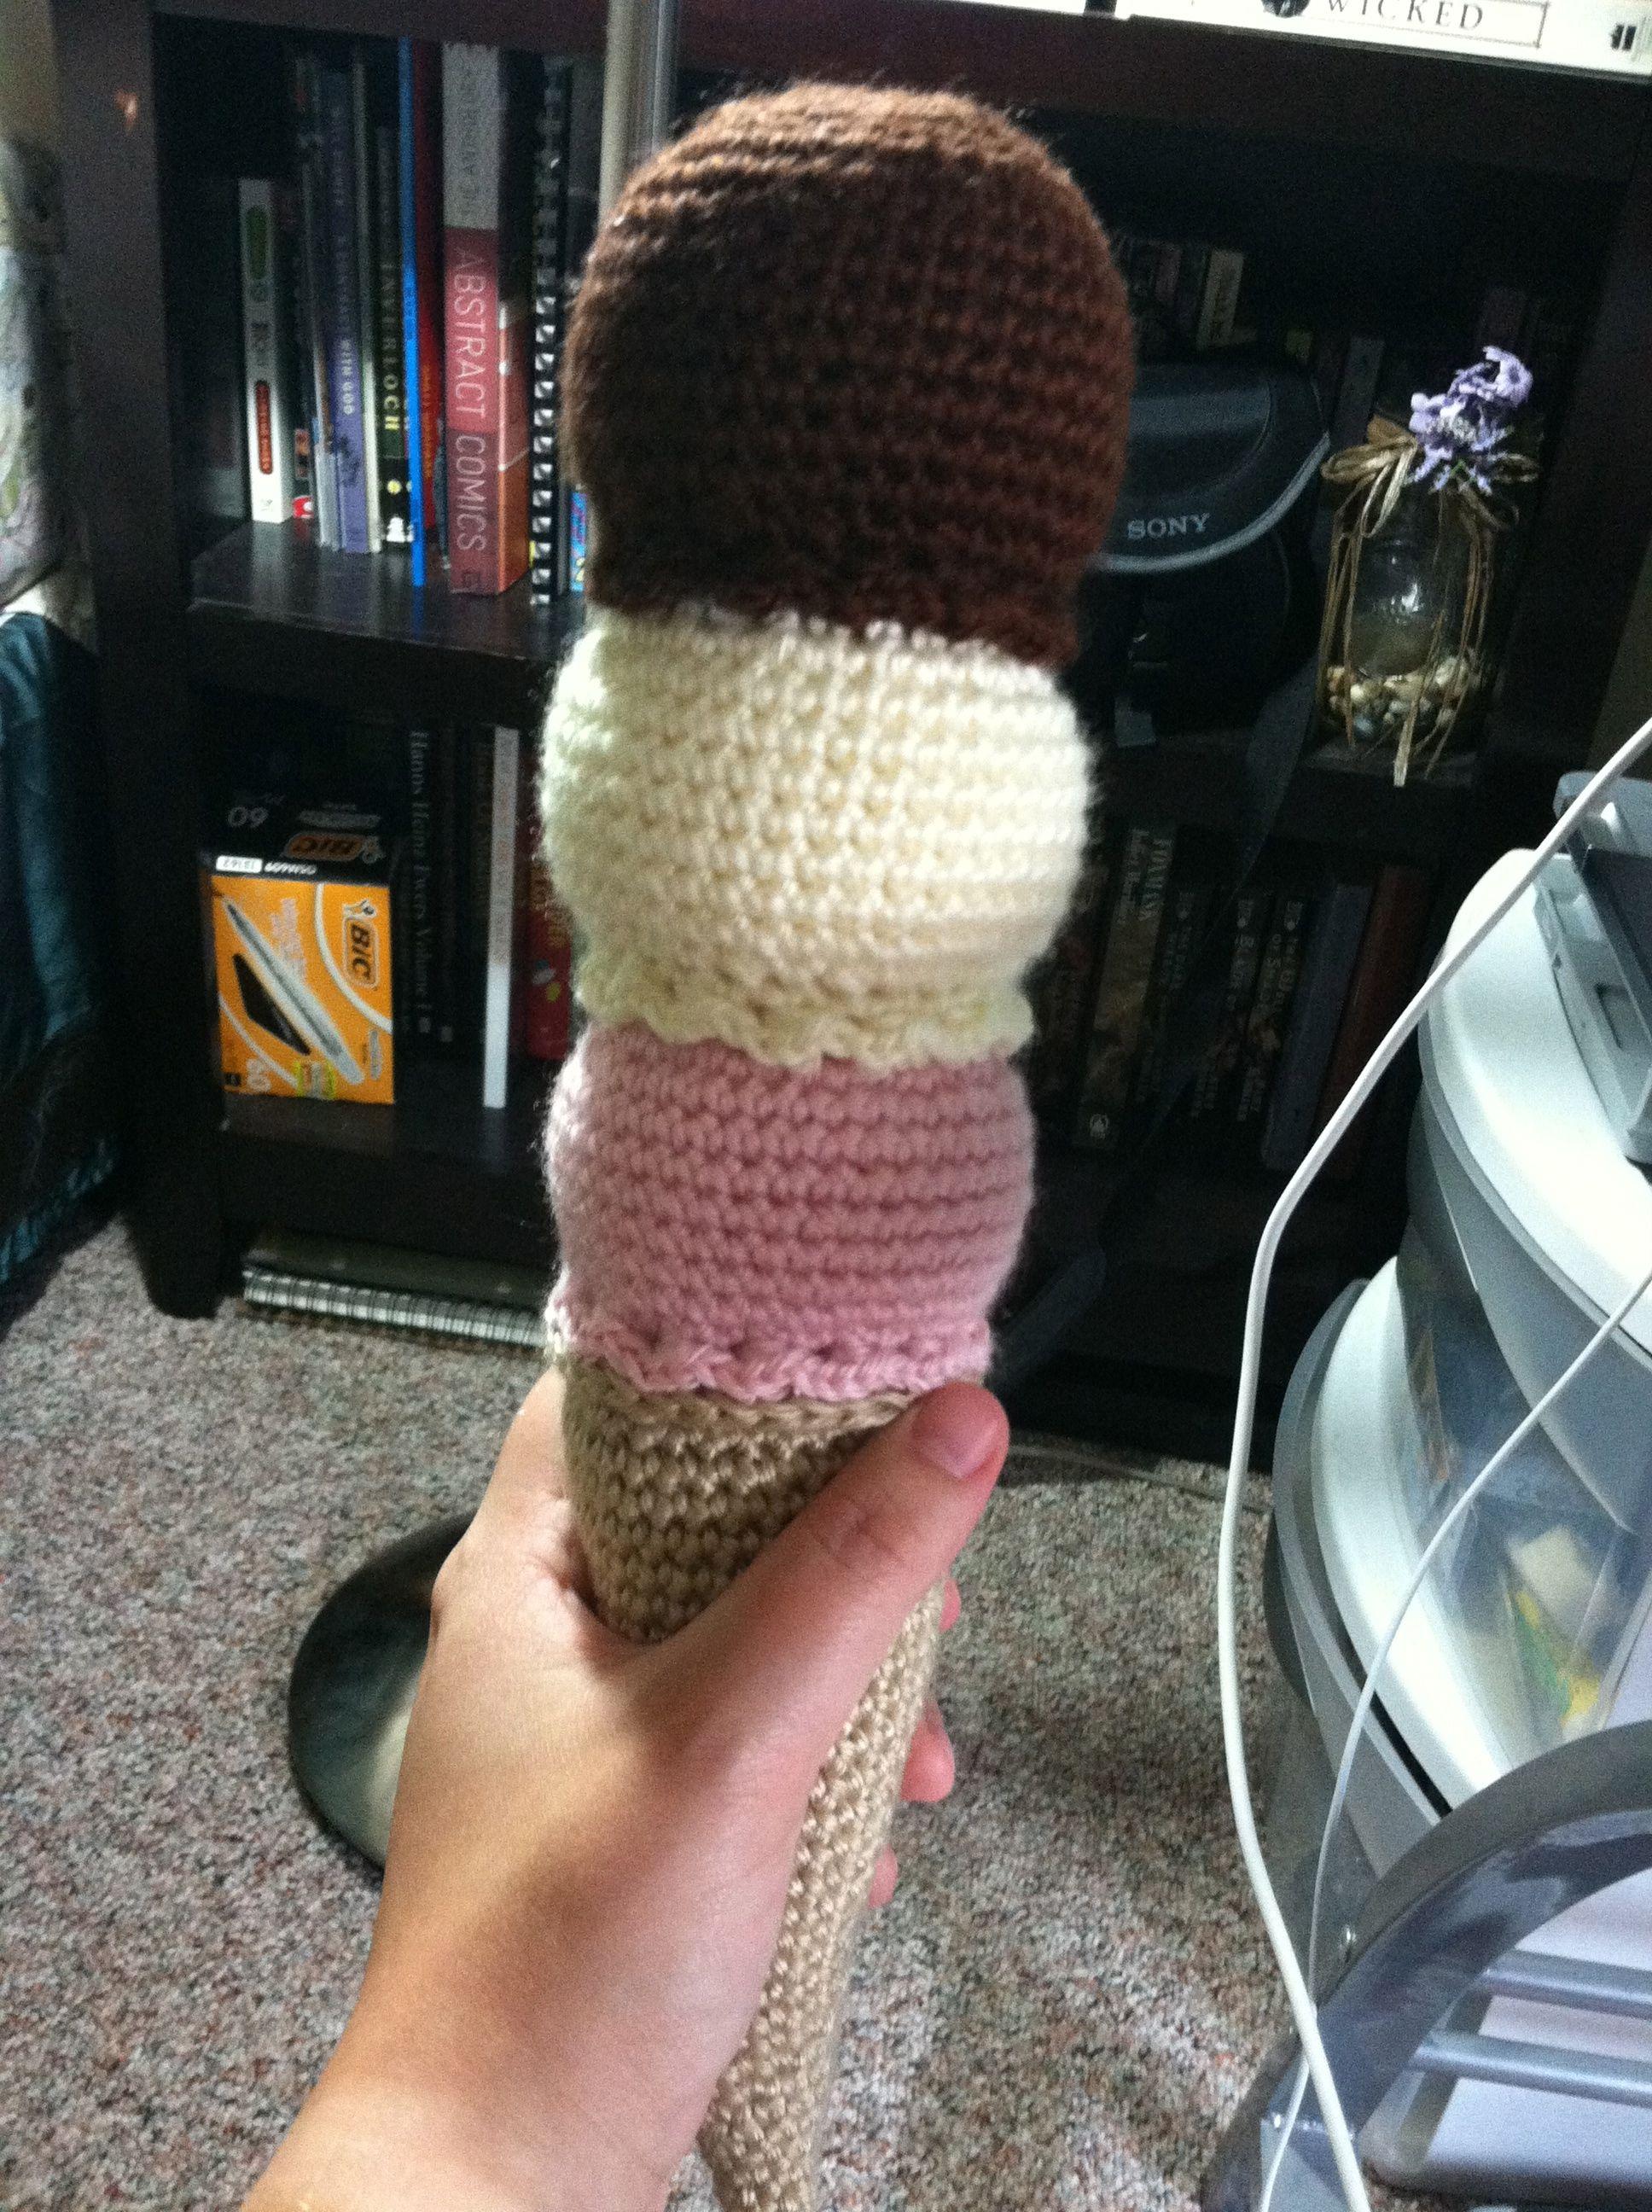 3 scoop ice cream cone crochet pattern ice cream cones food 3 scoop ice cream cone crochet pattern bankloansurffo Choice Image